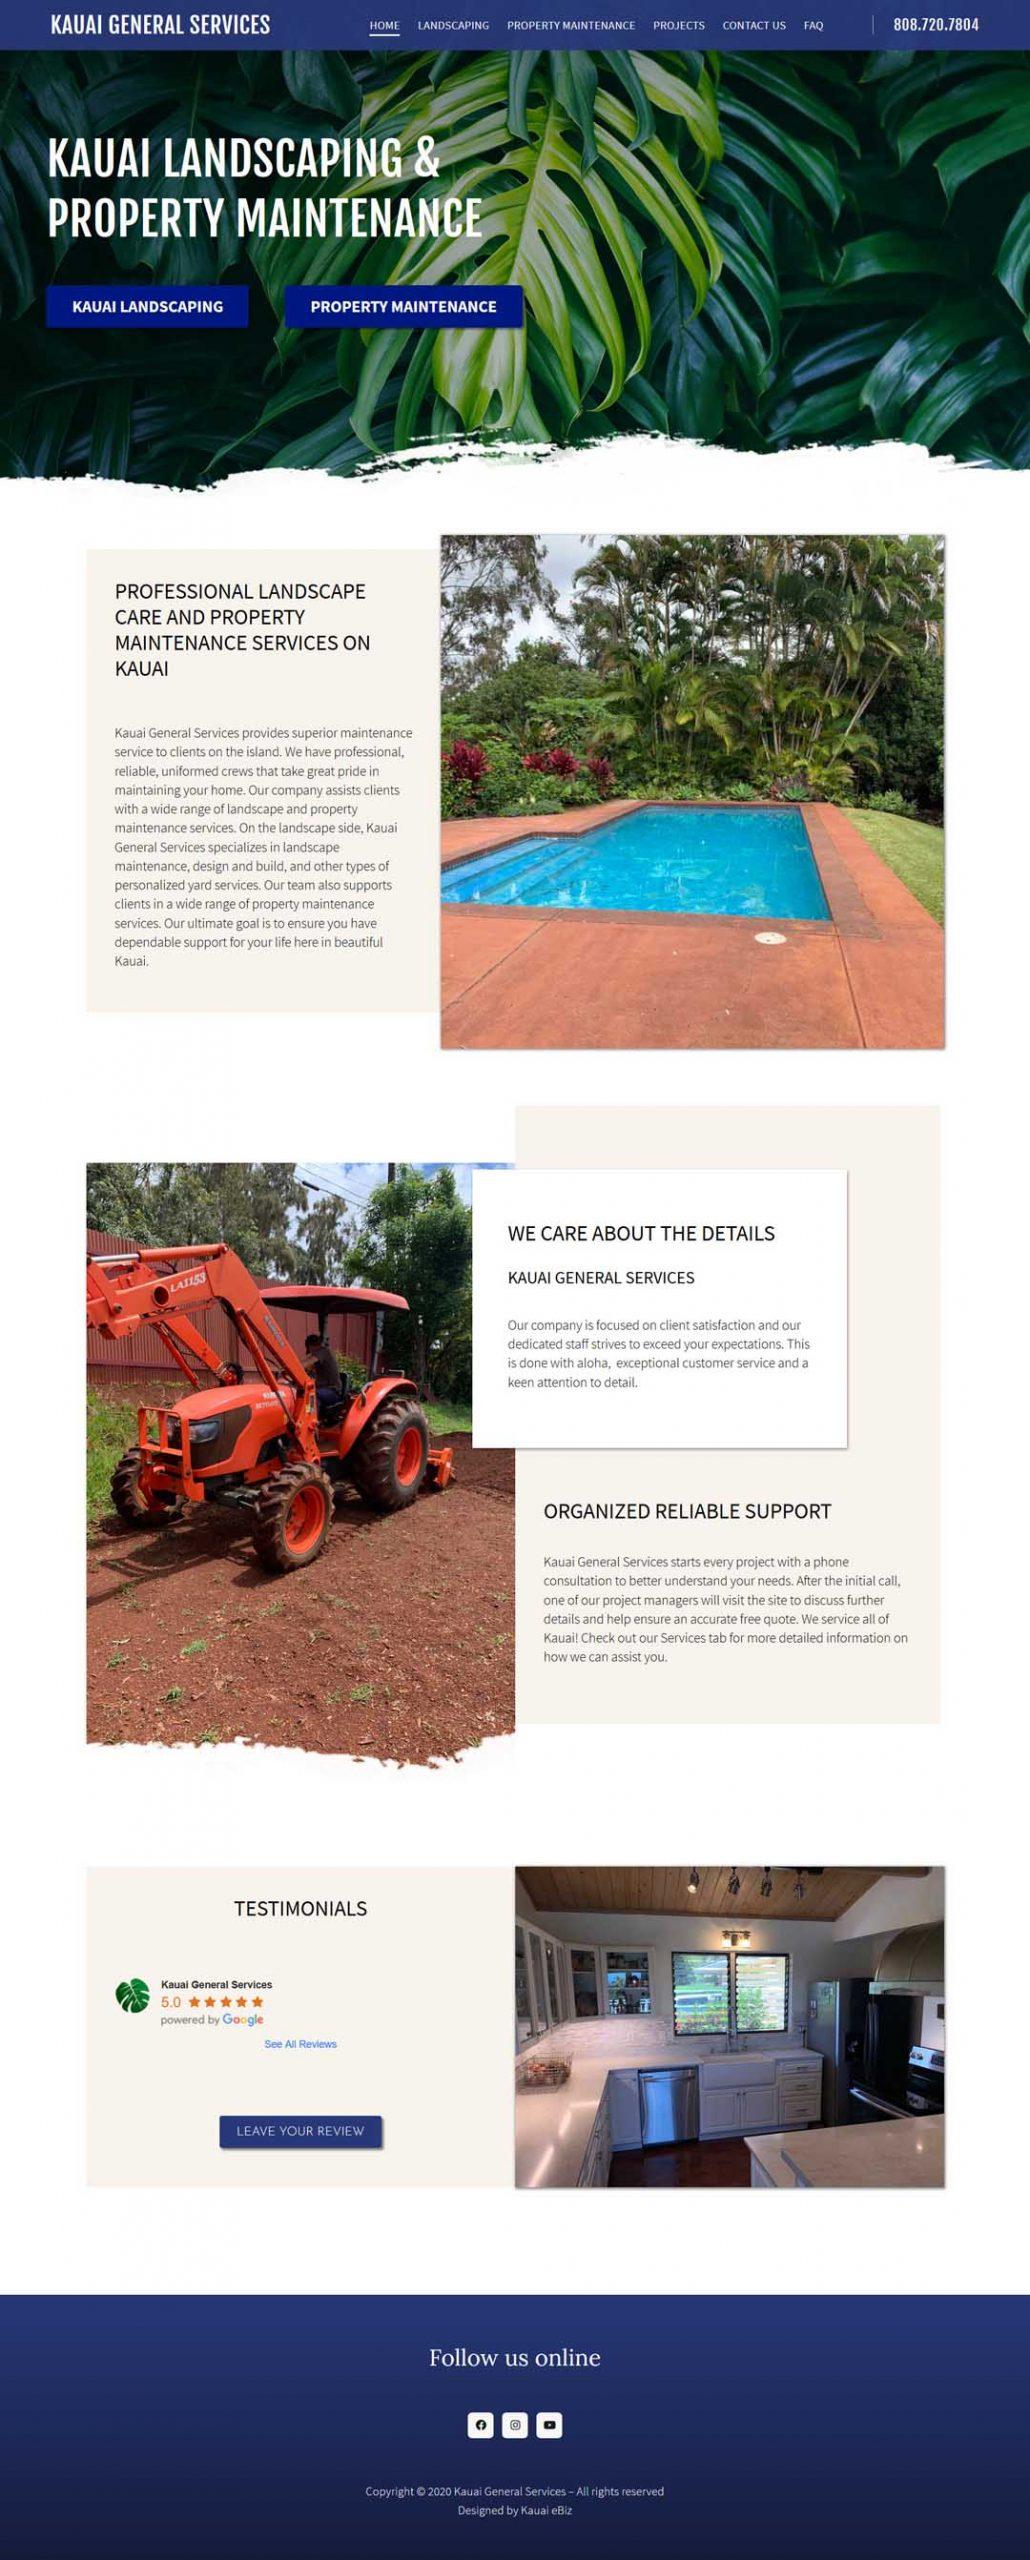 Kauai Landscaping & Property Maintenance Web Development